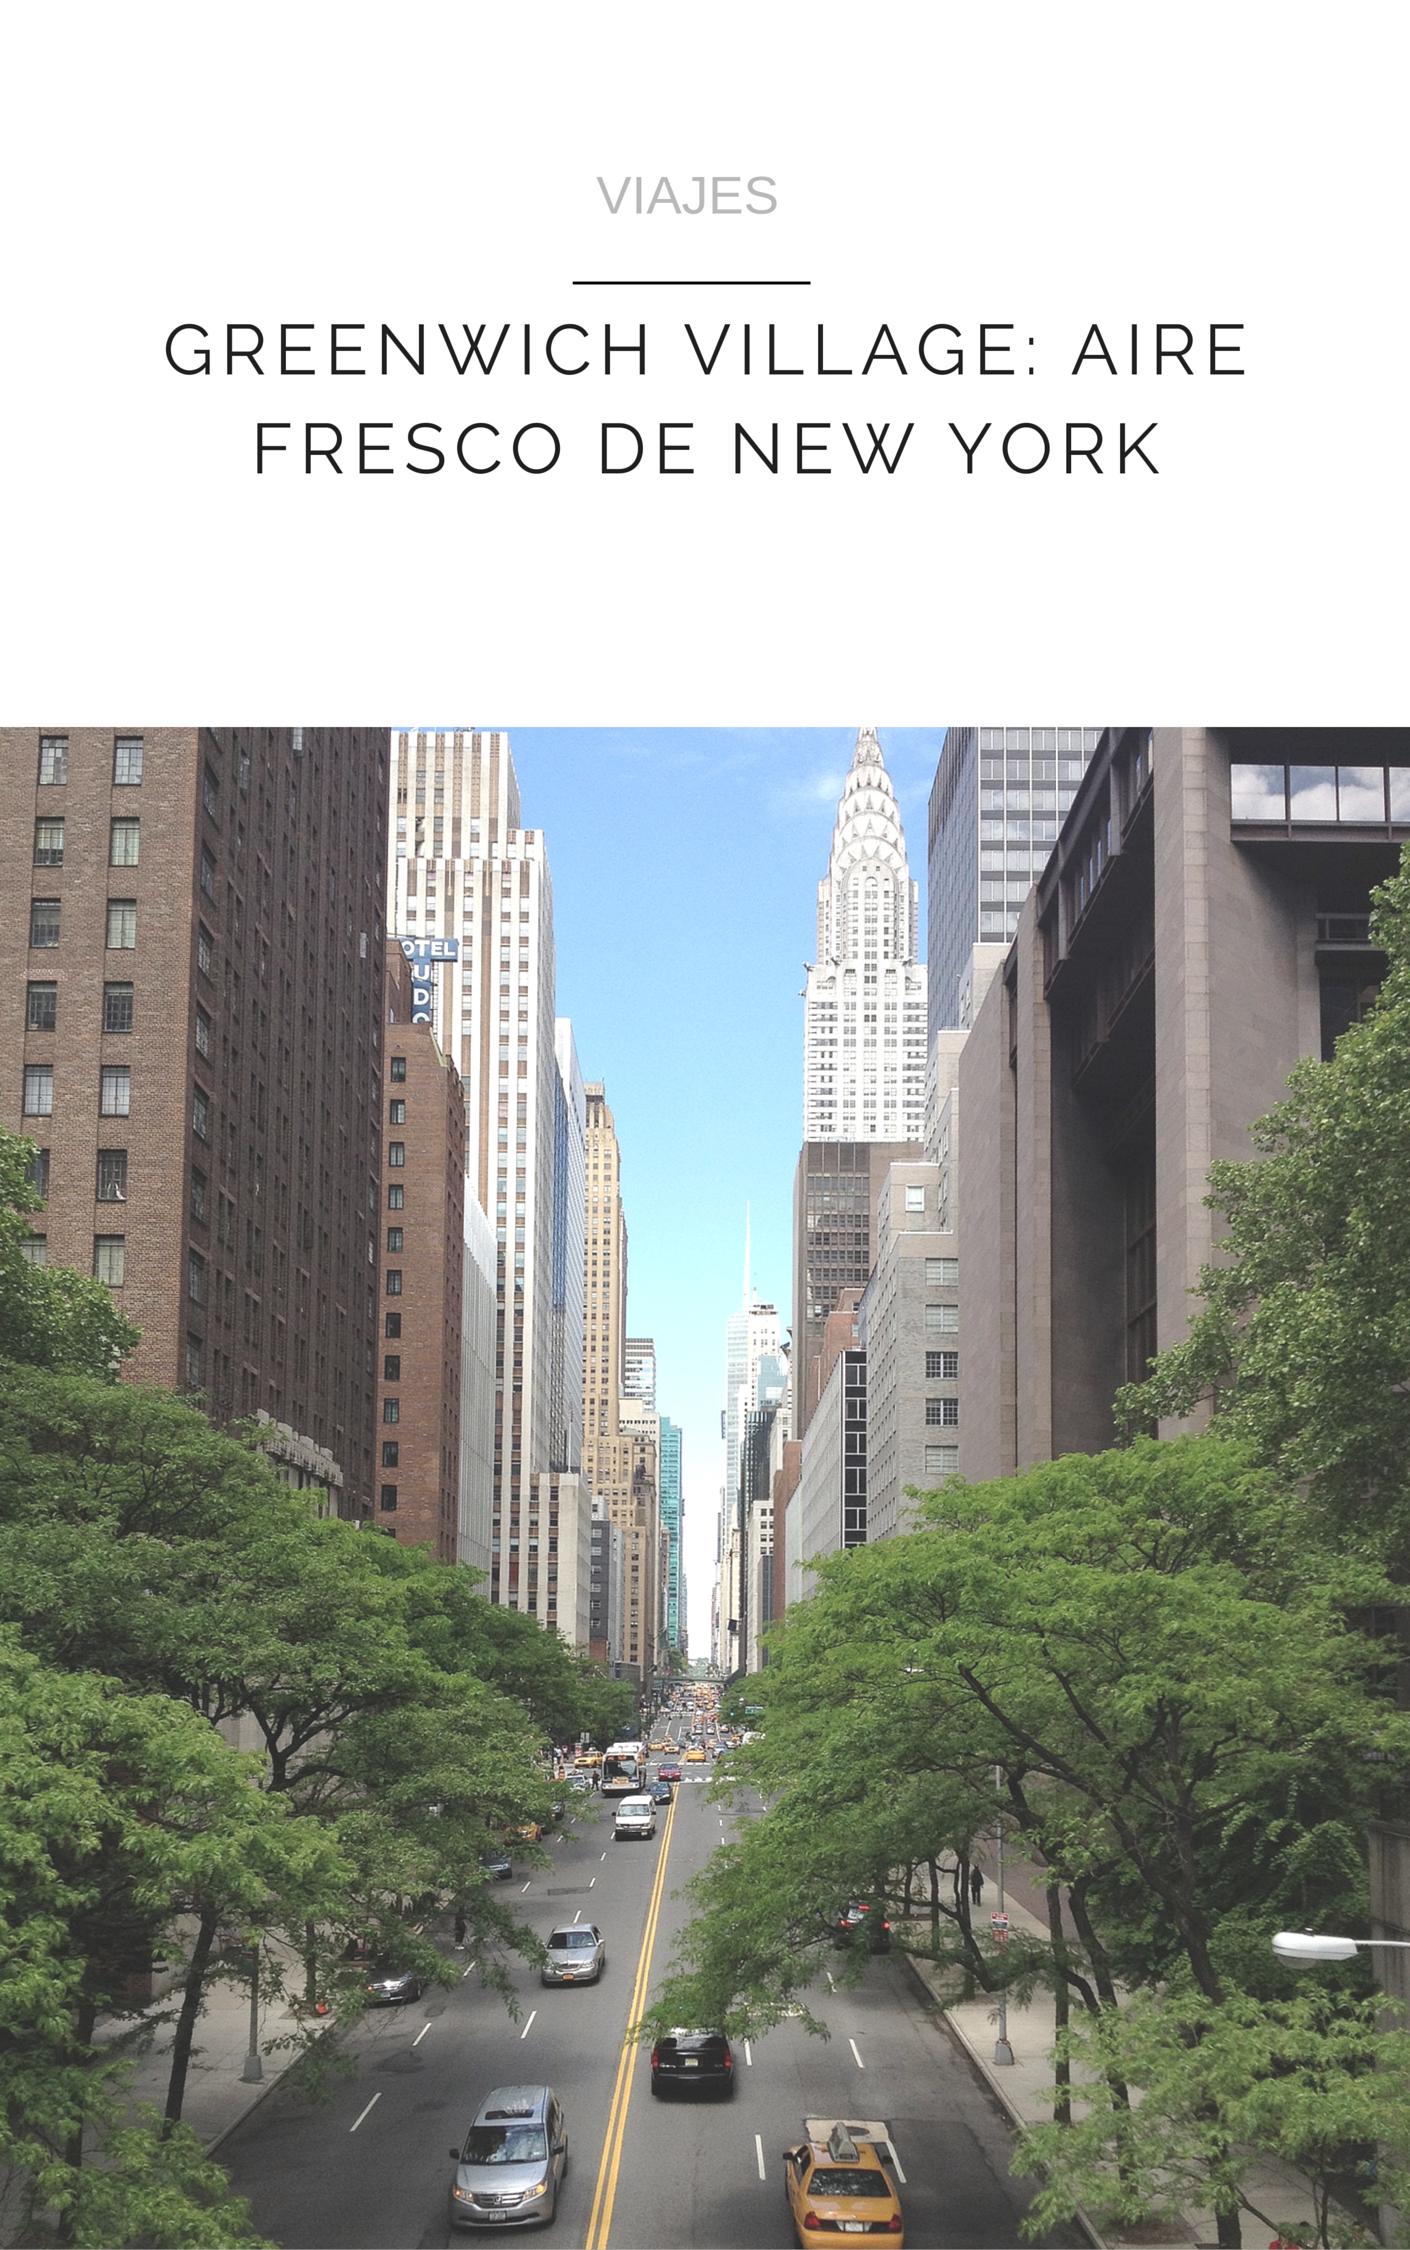 GREENWICH VILLAGE: AIRE FRESCO DE NEW YORK